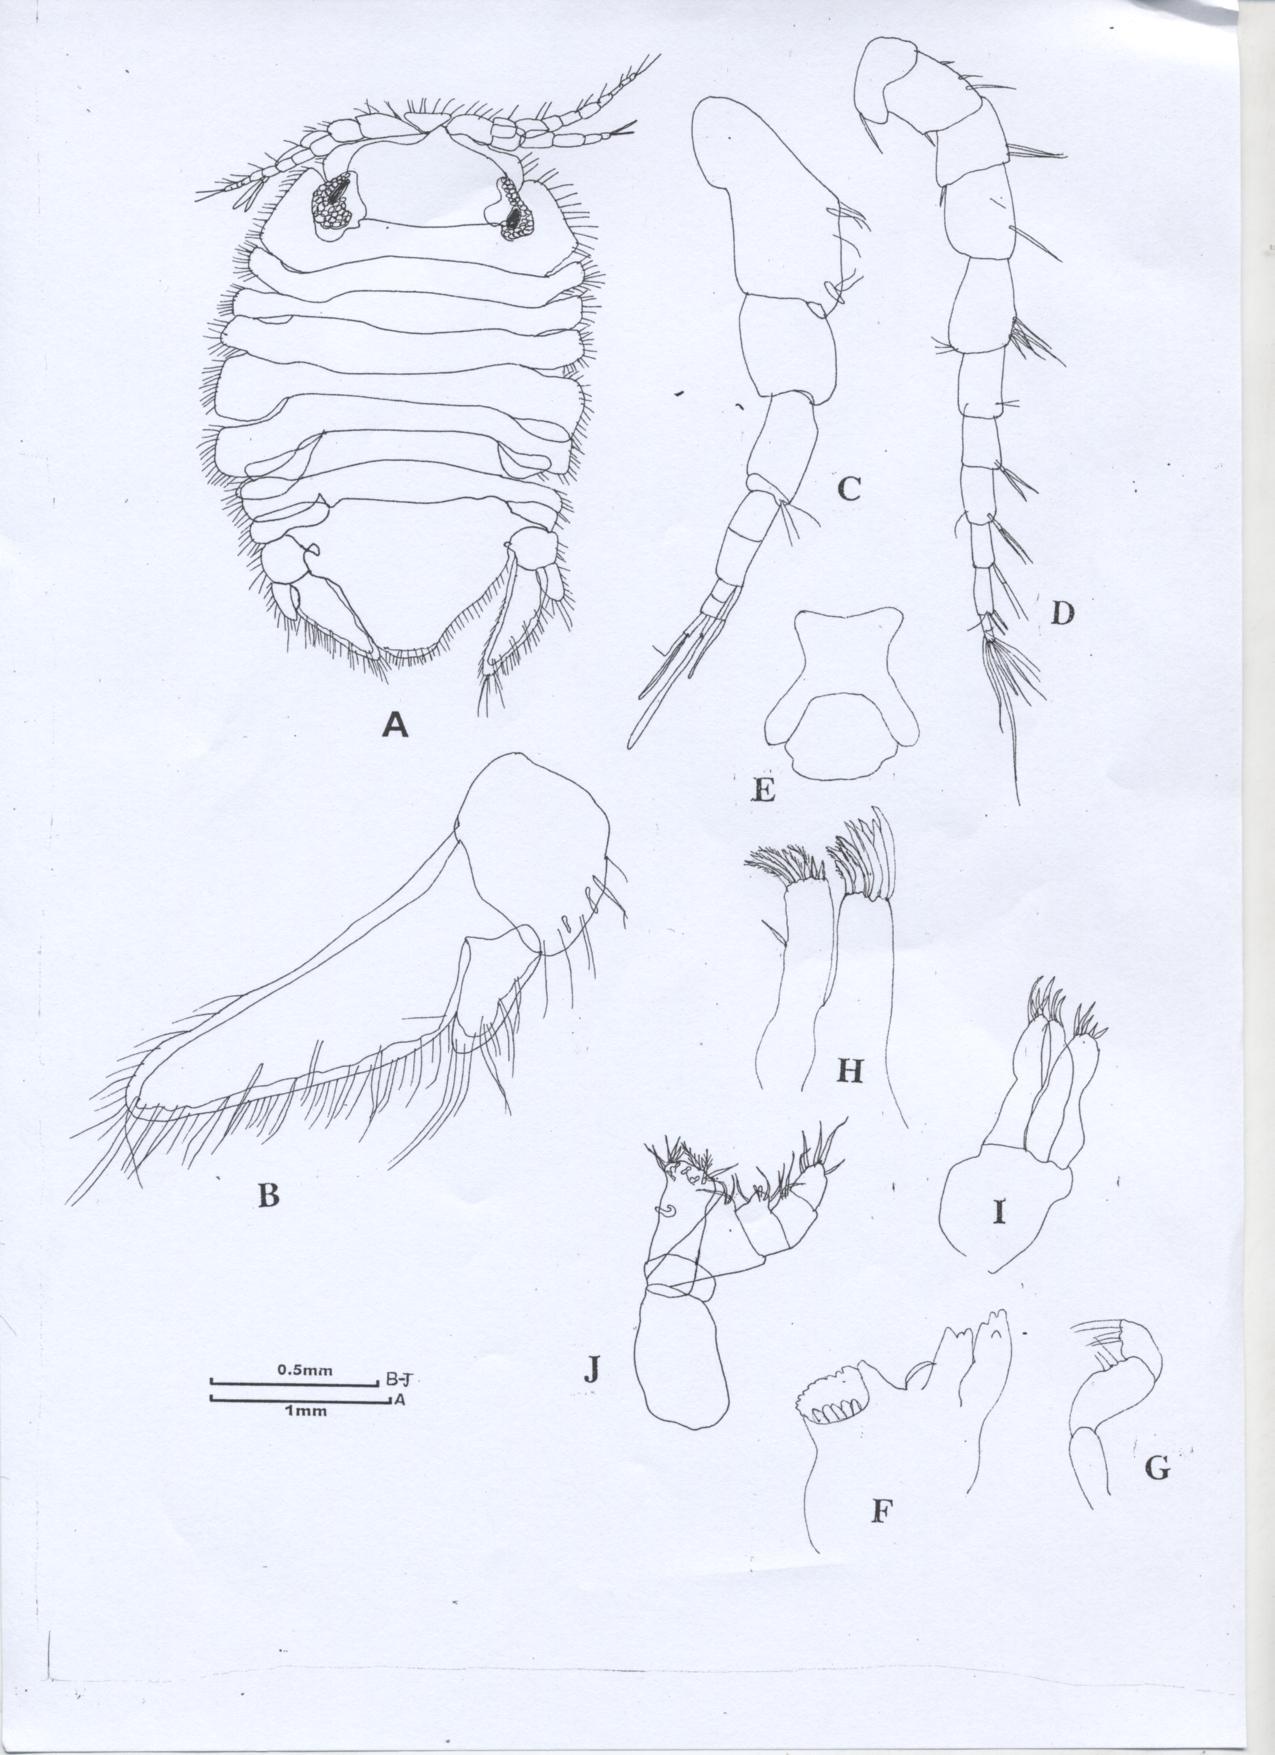 Heterodina qeshmensis Khalaji & Bruce, 2014 [6], A, dorsal view; B, uropod; C, antenna 1; D, antenna 2; E, epistome; F, left mandible; G, mandible palp; G, maxilla 1; H, maxilla 2